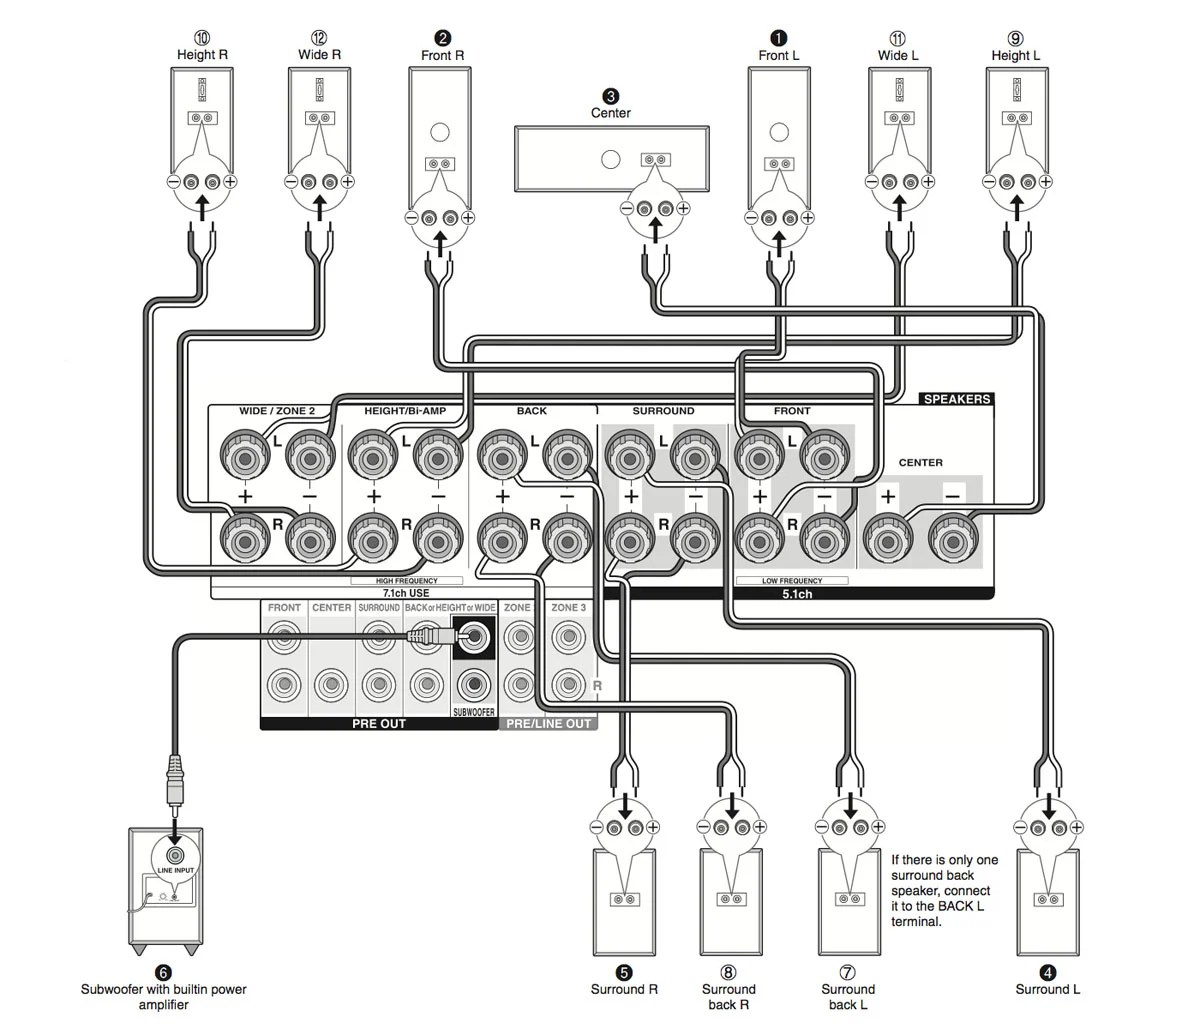 hight resolution of onkyo wiring diagram wiring diagrams schematiconkyo wiring diagram wiring library diagram z2 braun wiring diagram onkyo